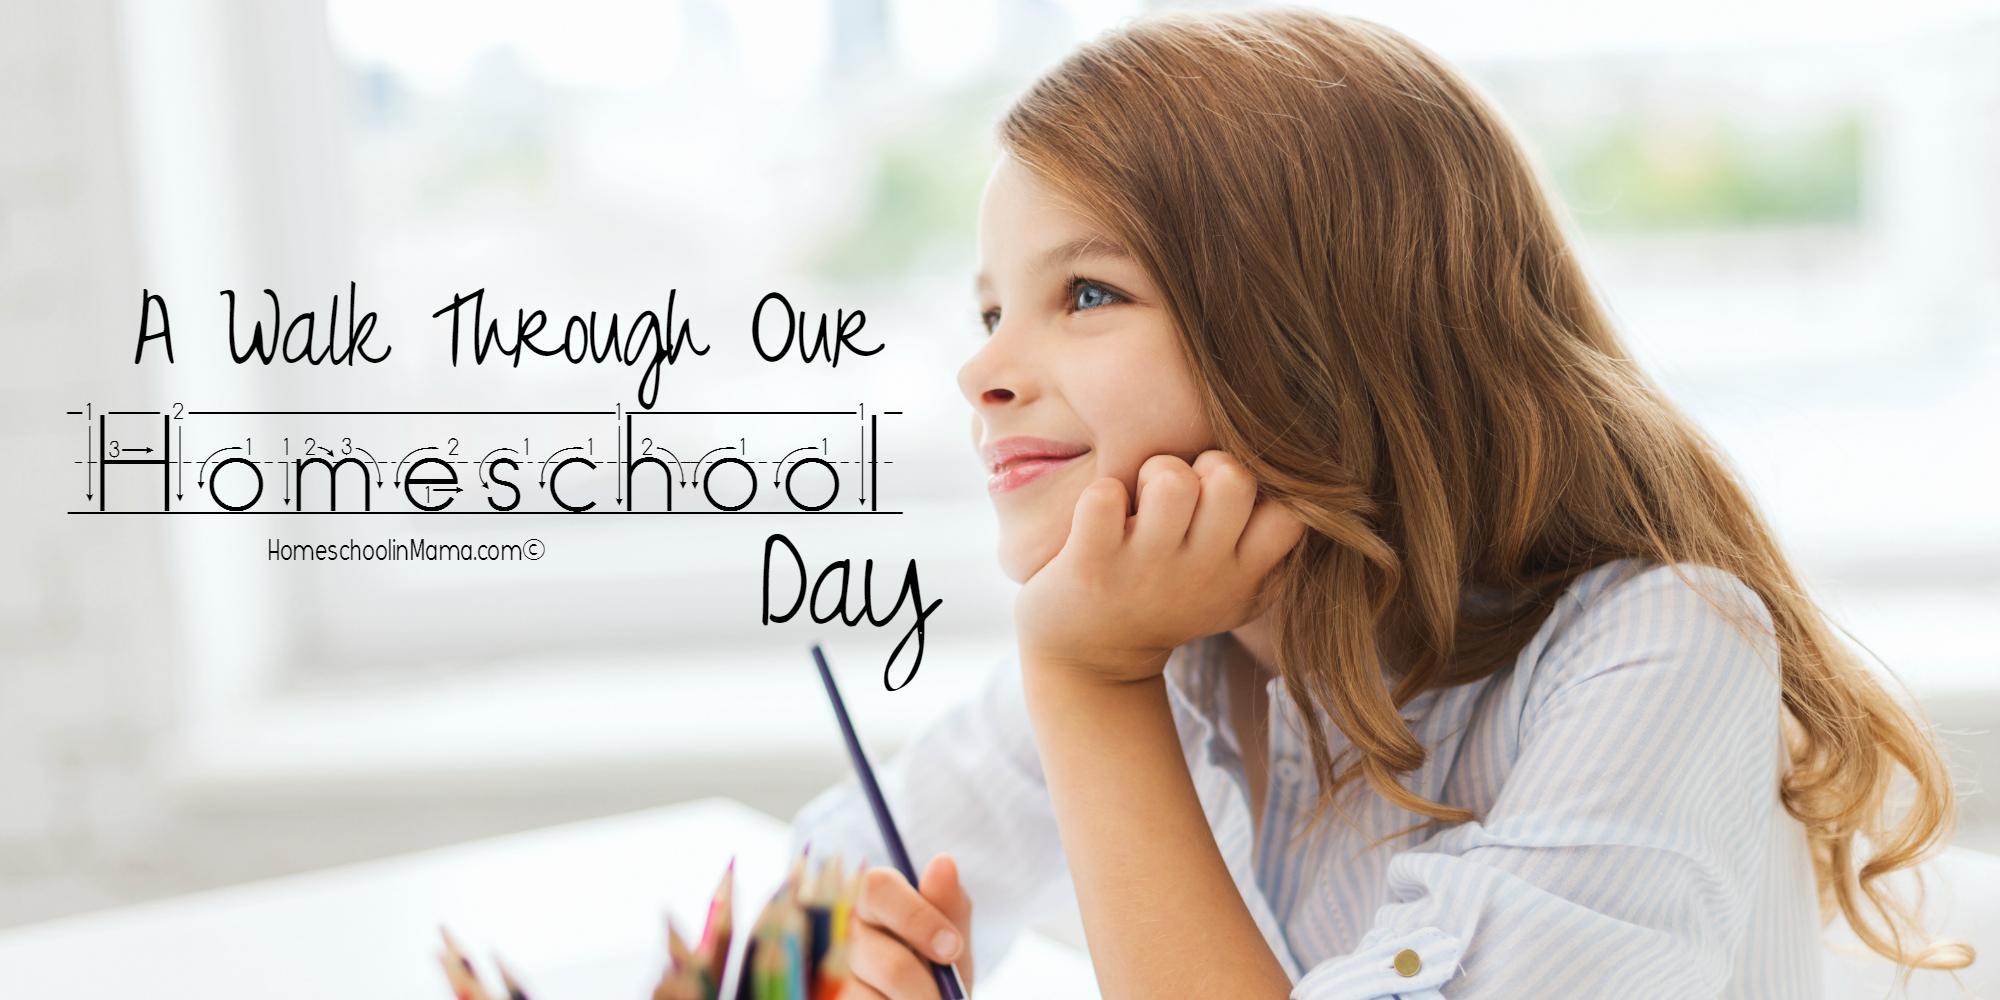 A Walk Through Our Homeschool Day